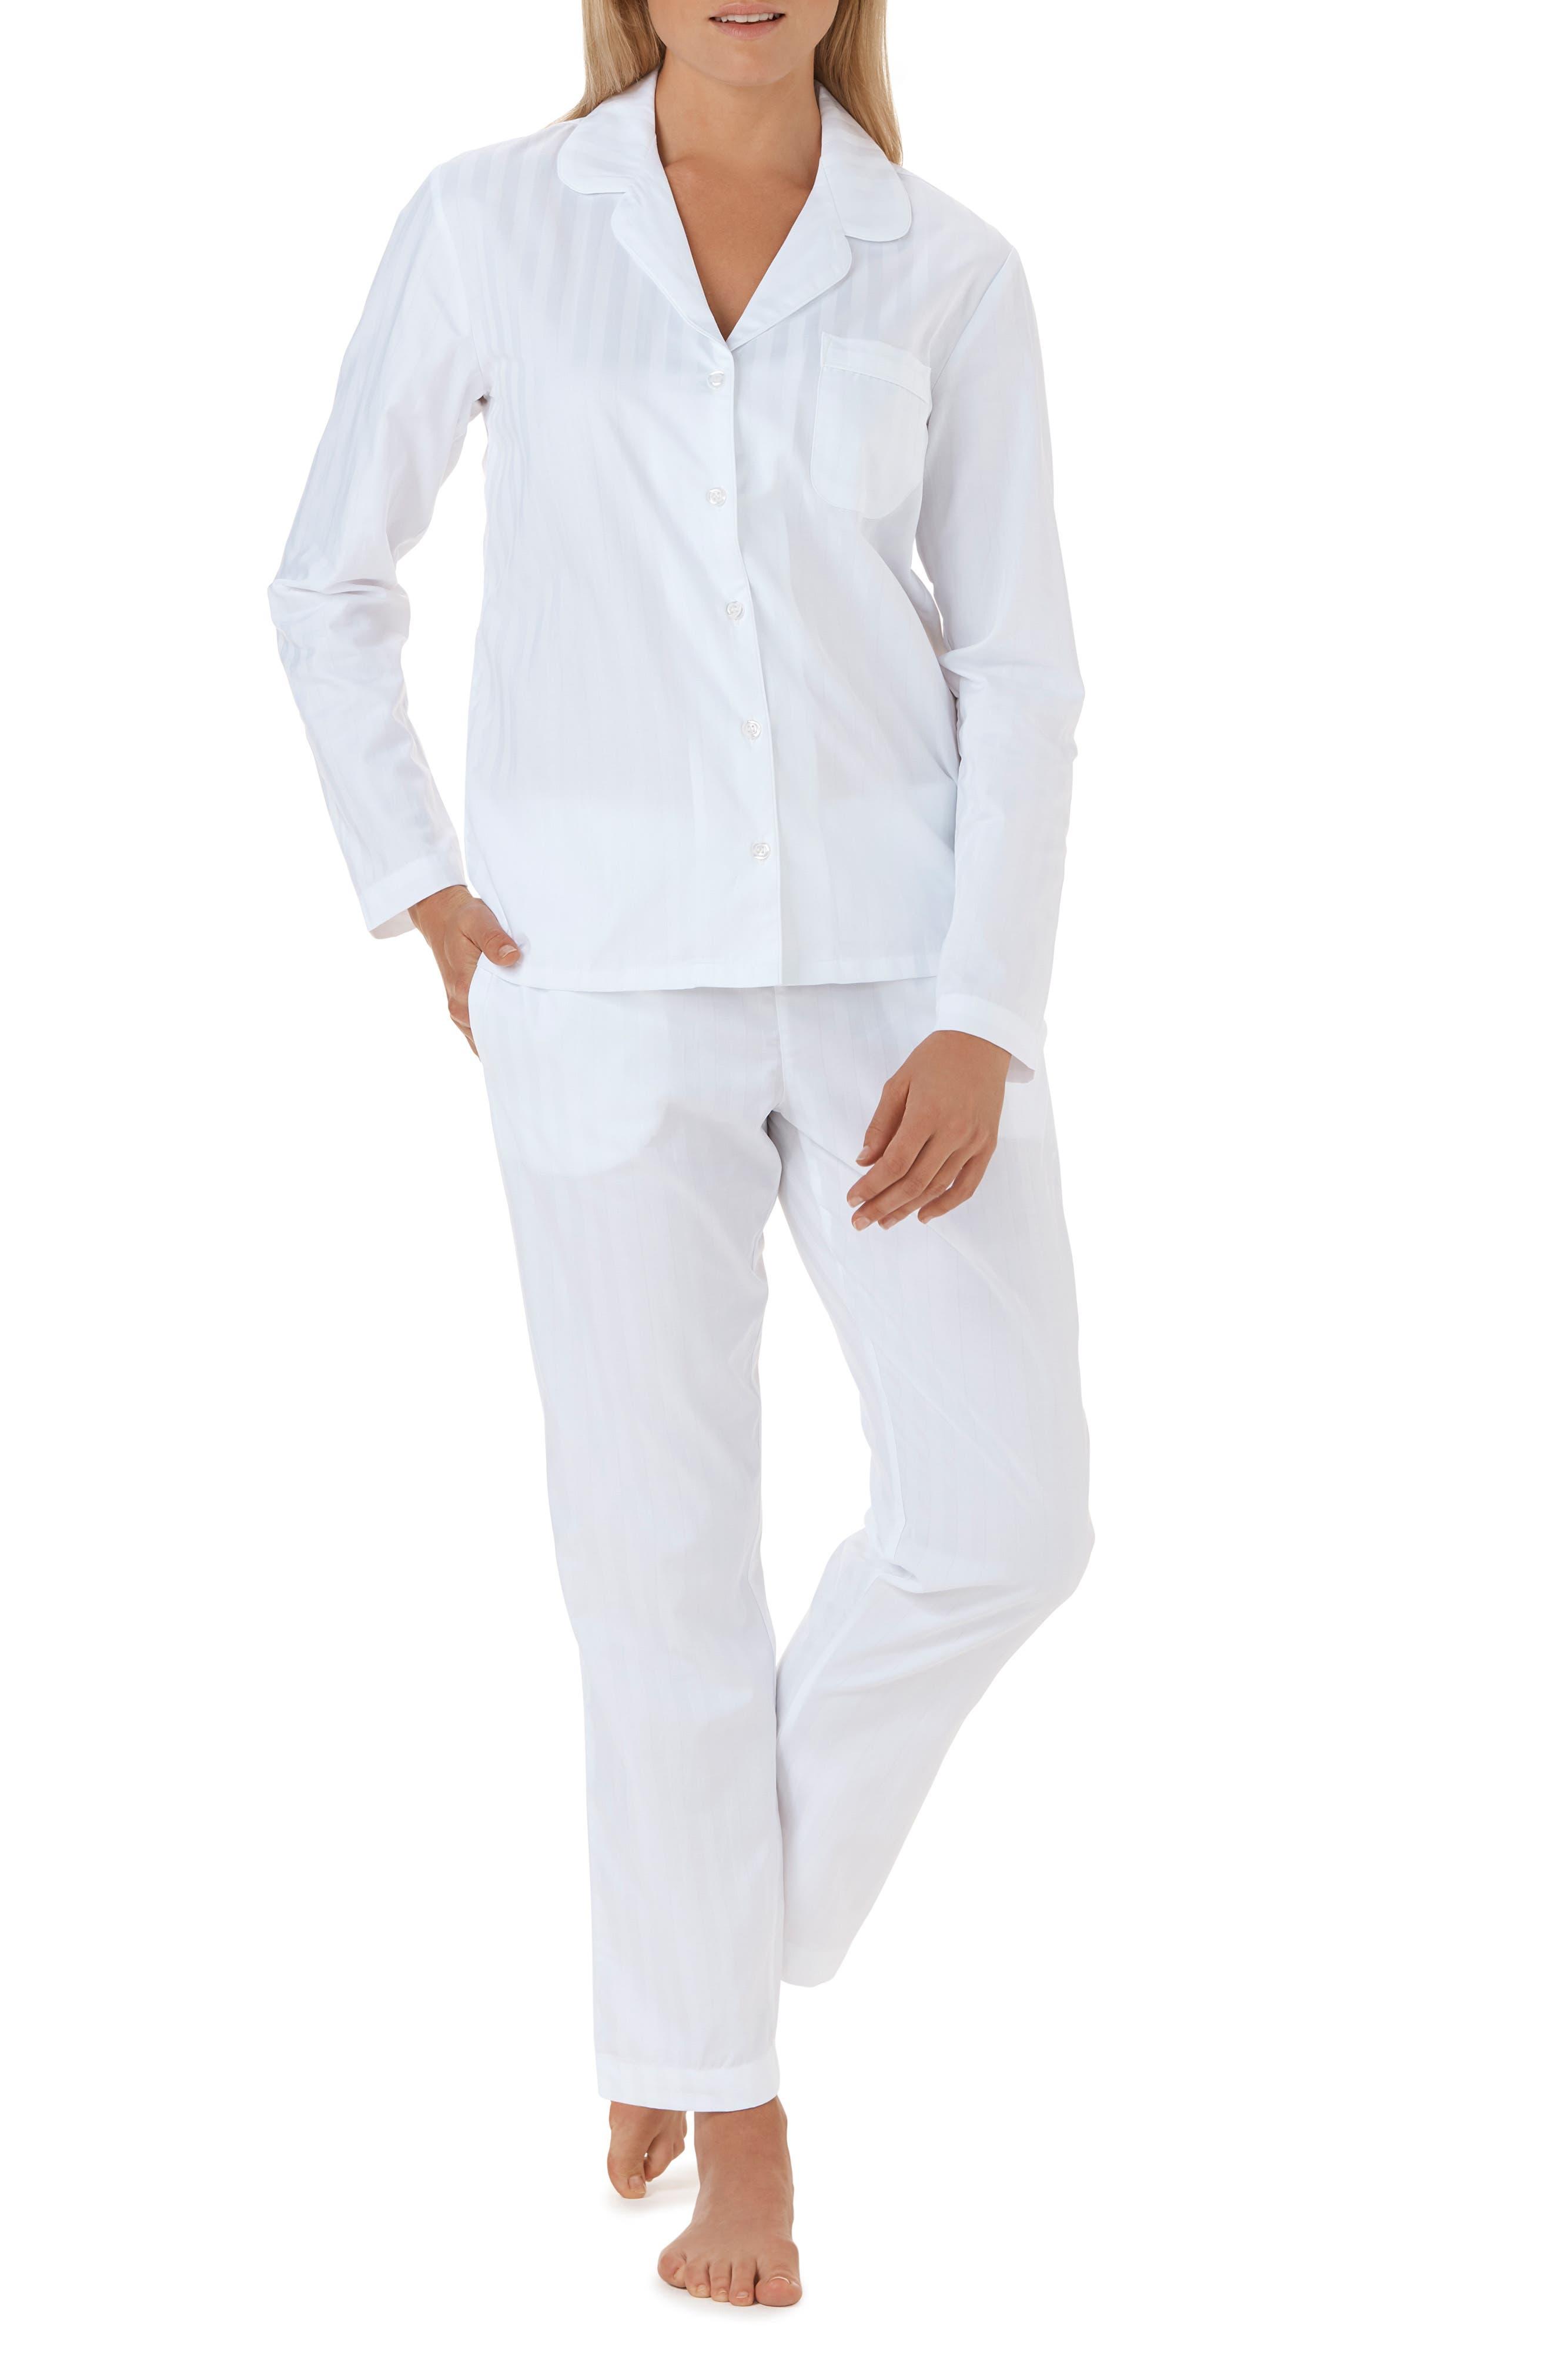 THE WHITE COMPANY Cotton Pajamas, Main, color, WHITE